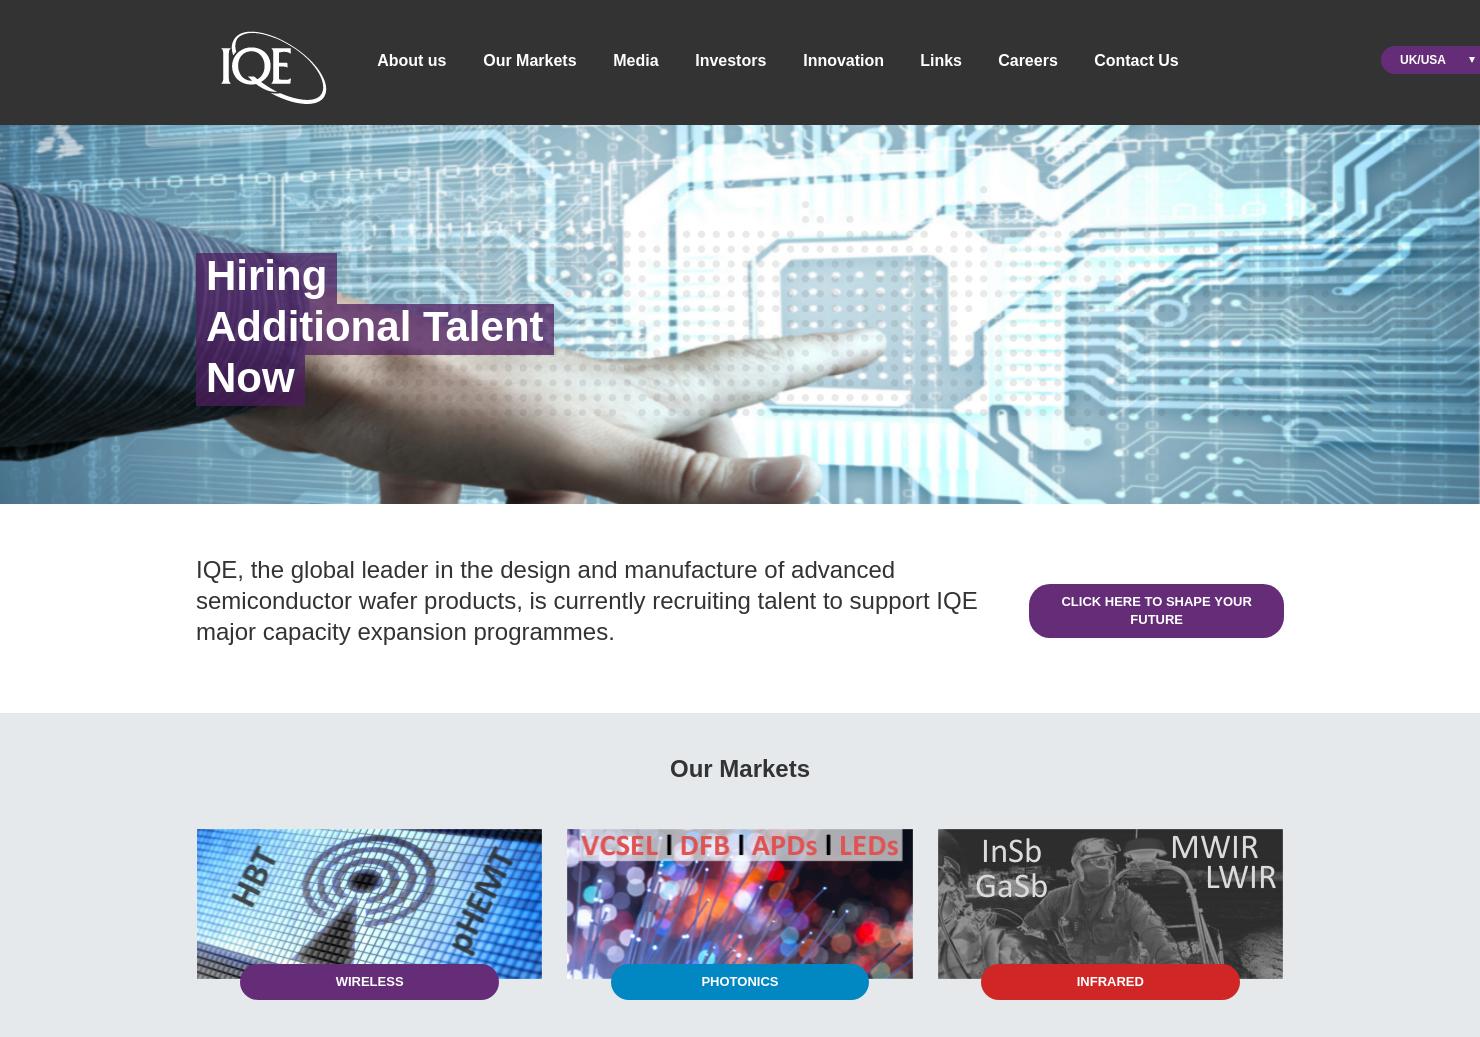 IQE Home Page